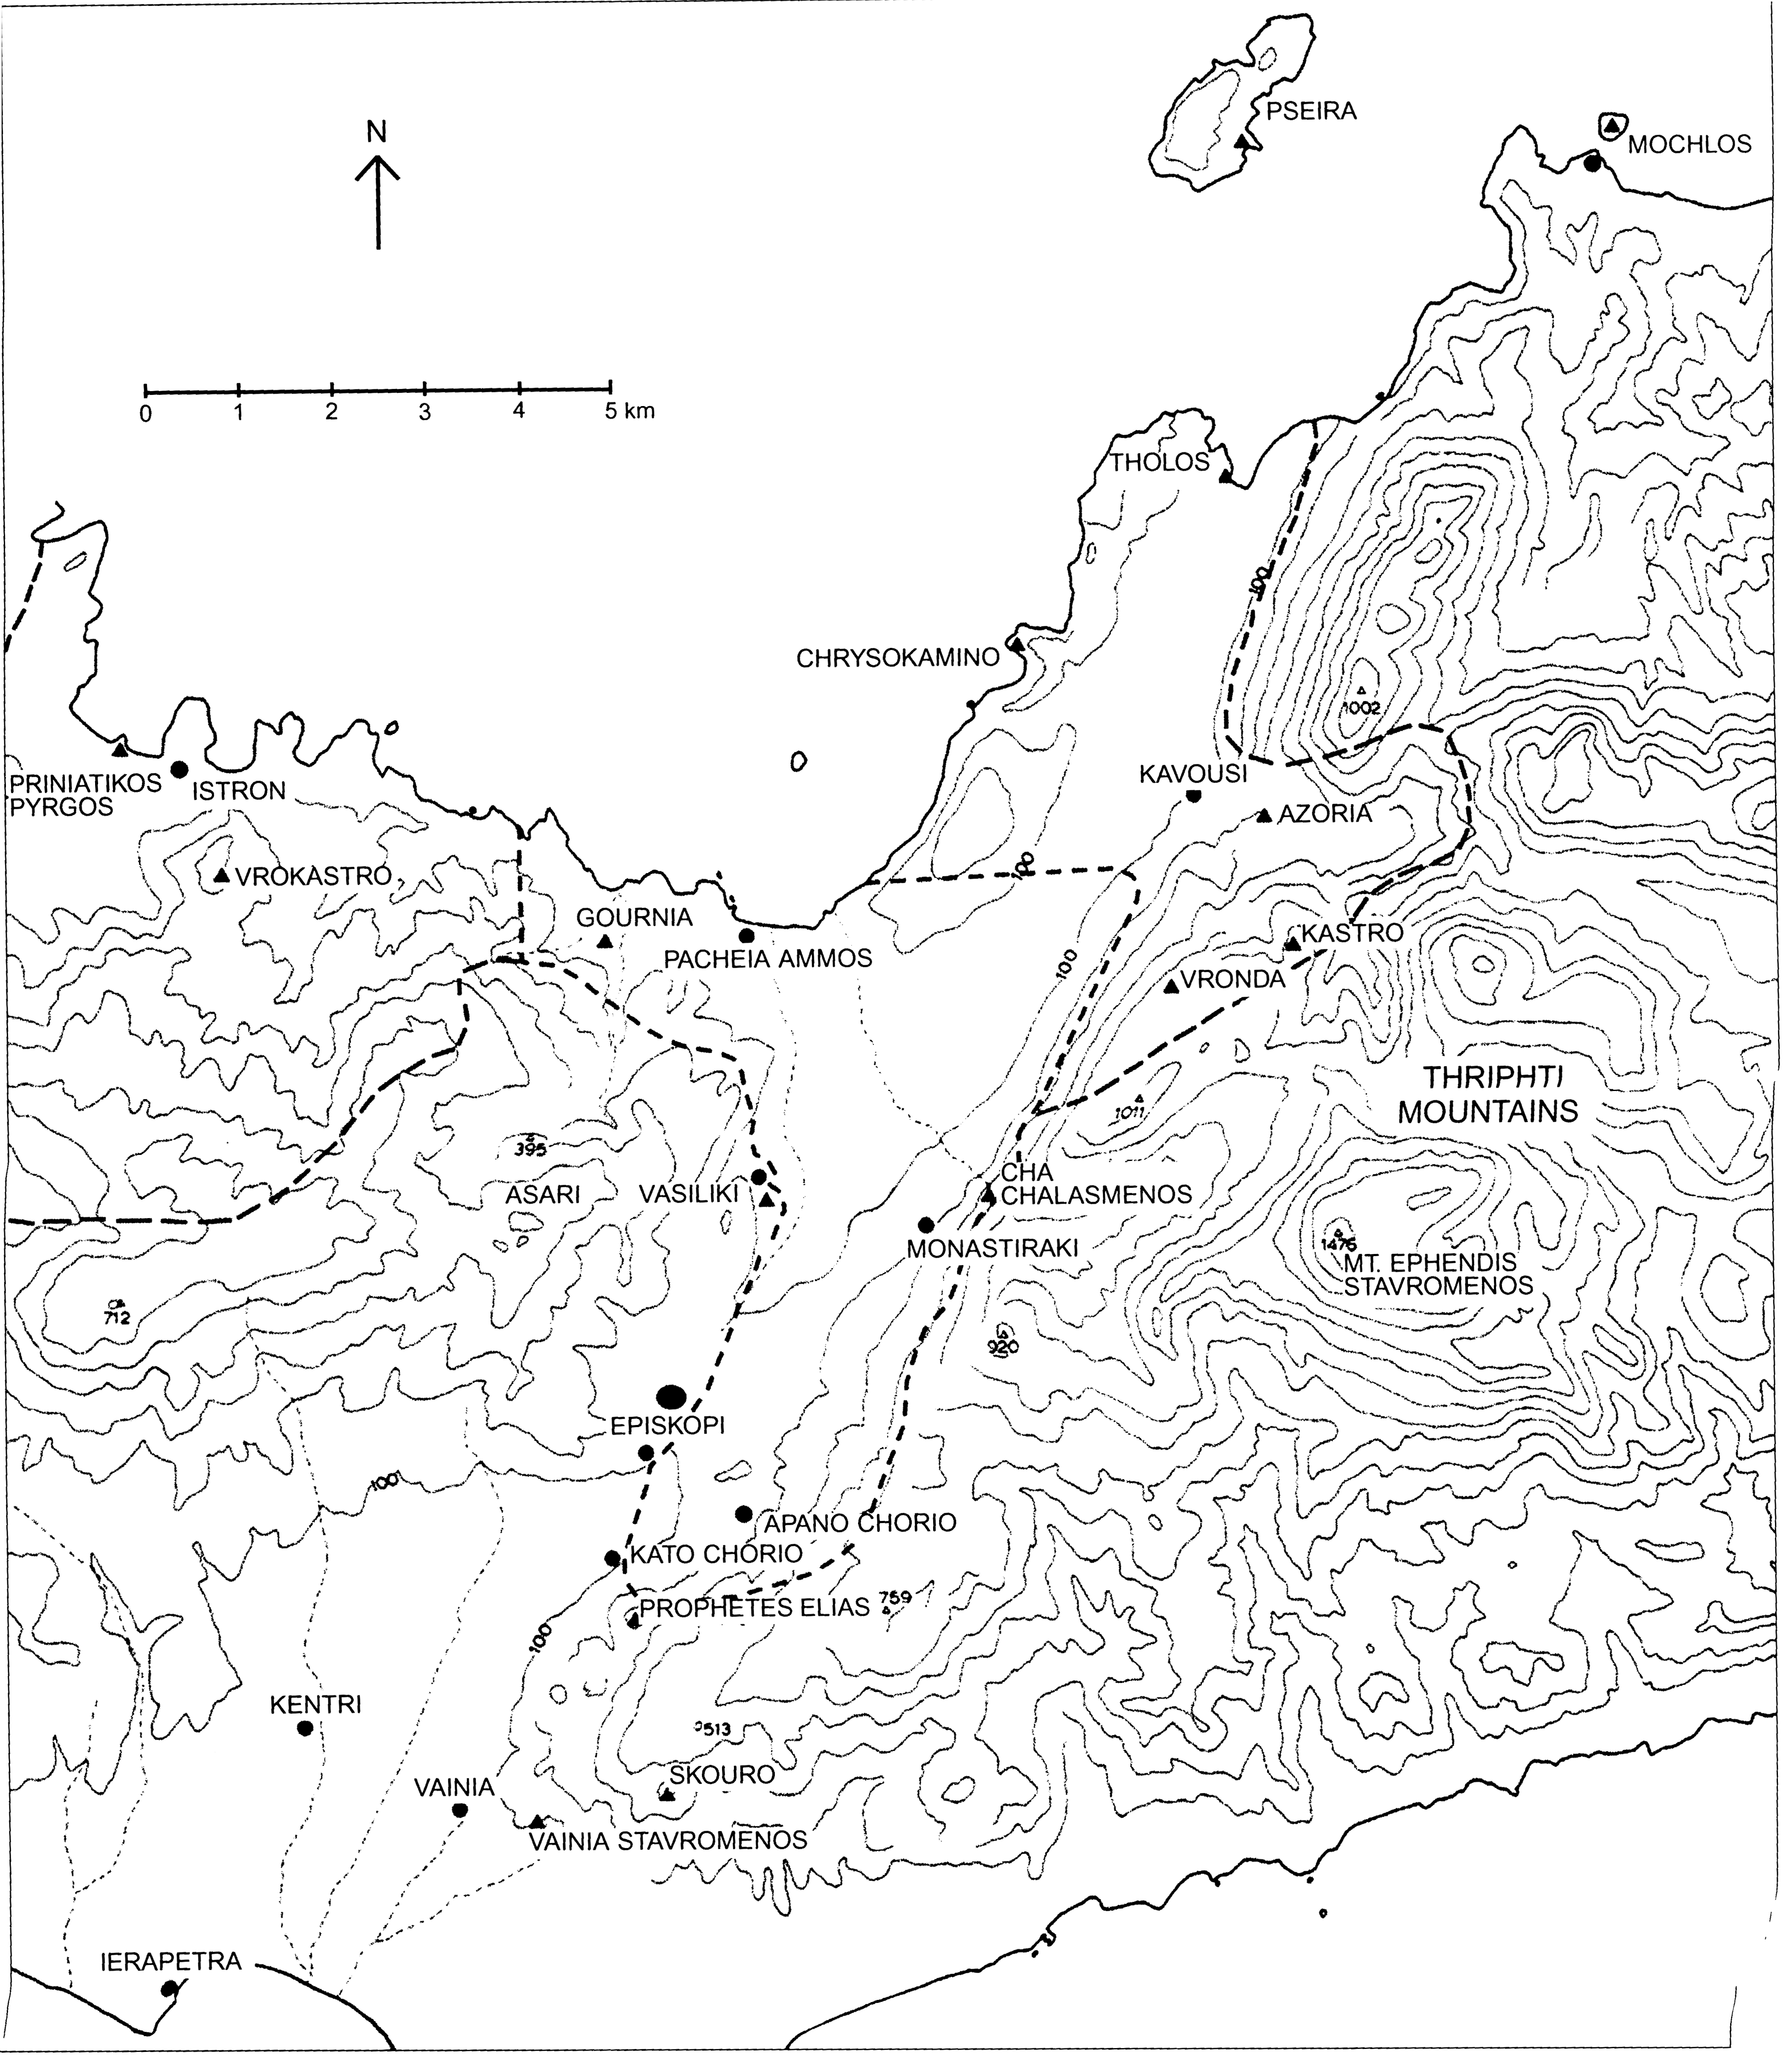 survey boundaries